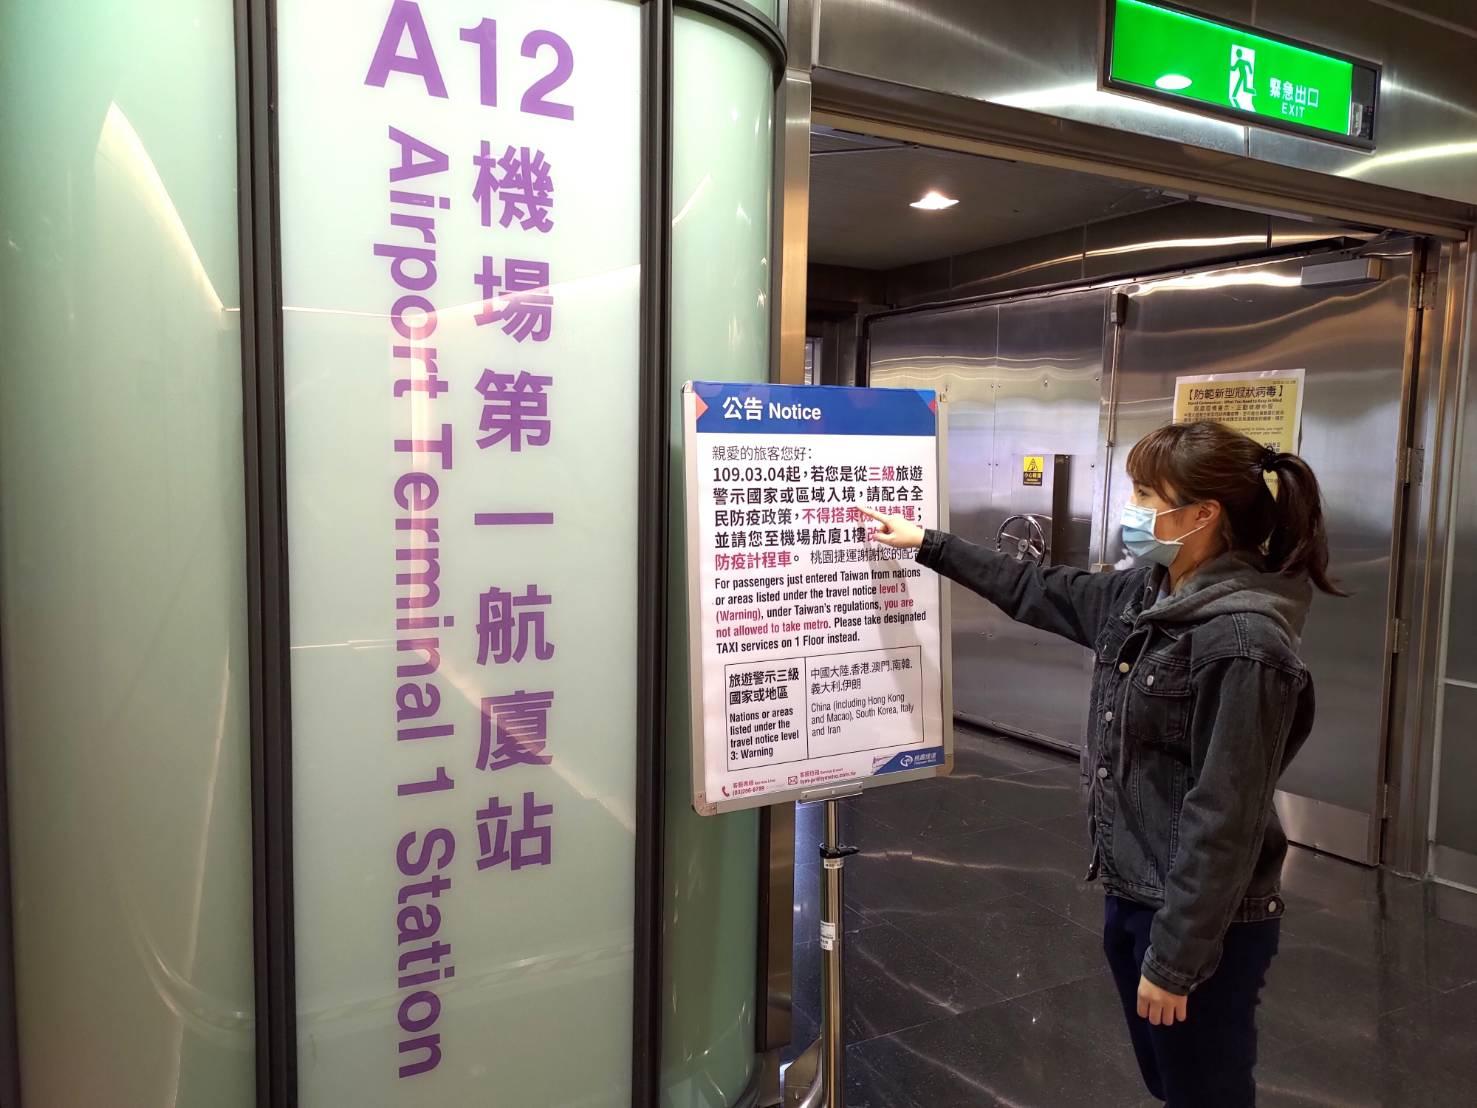 A12公告-從三級旅遊警示國家旅客不得搭乘大眾運輸工具